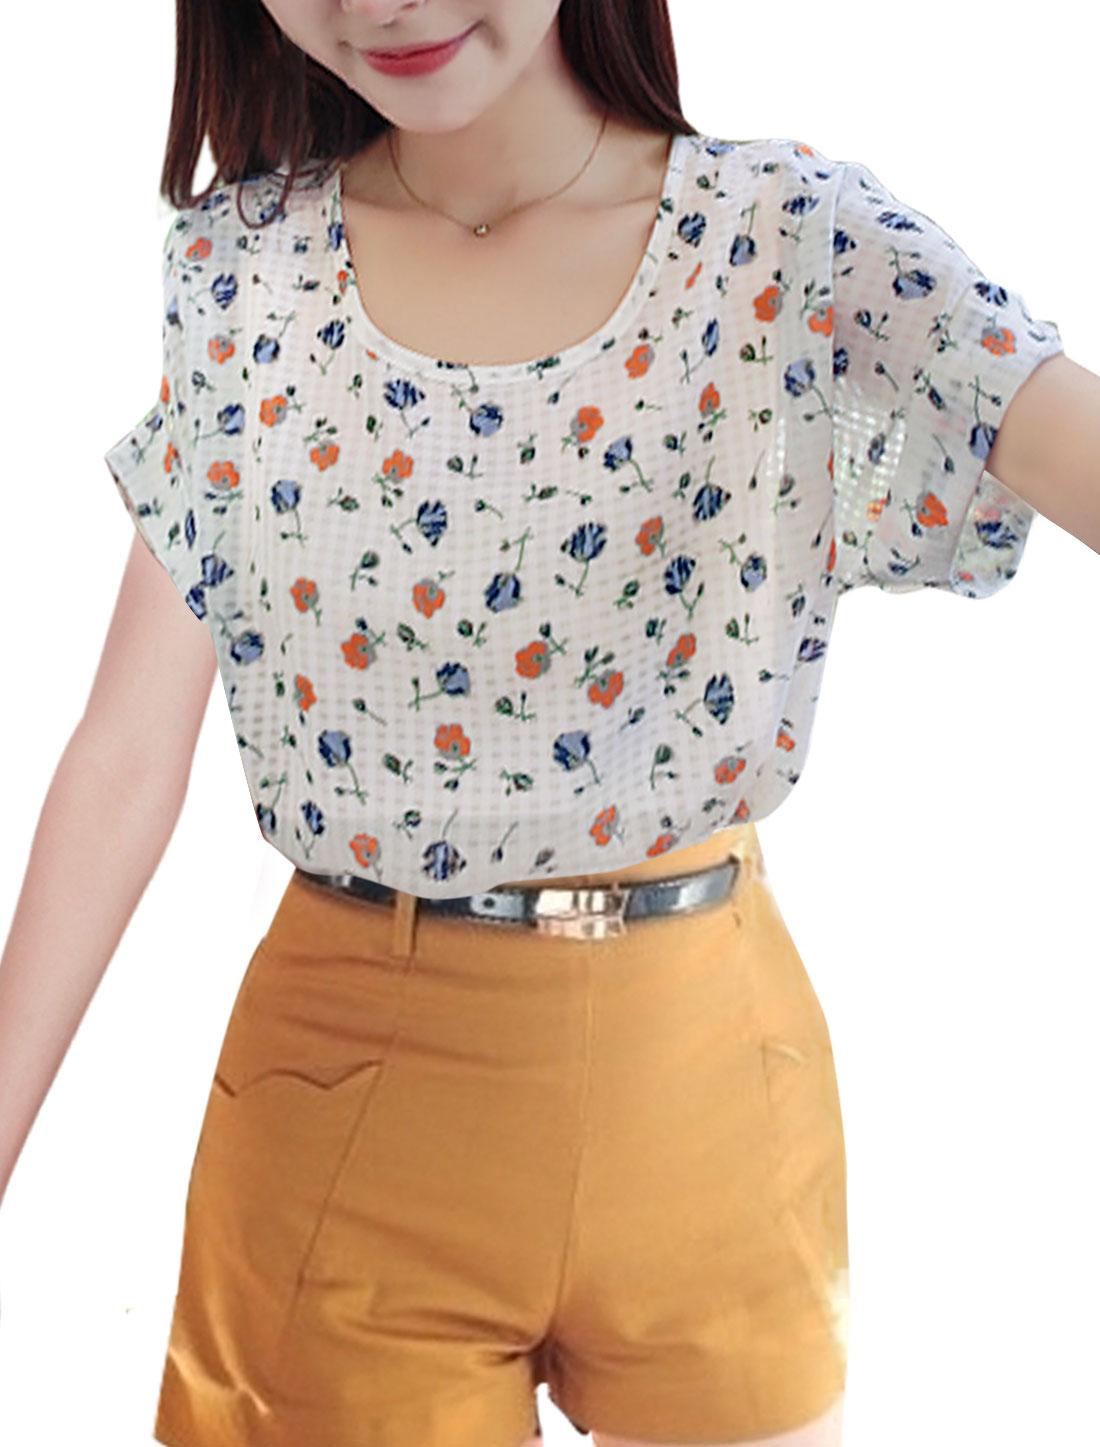 Woman Floral Prints Semi Sheer Plaids Short Sleeves Top Blue Orange XS